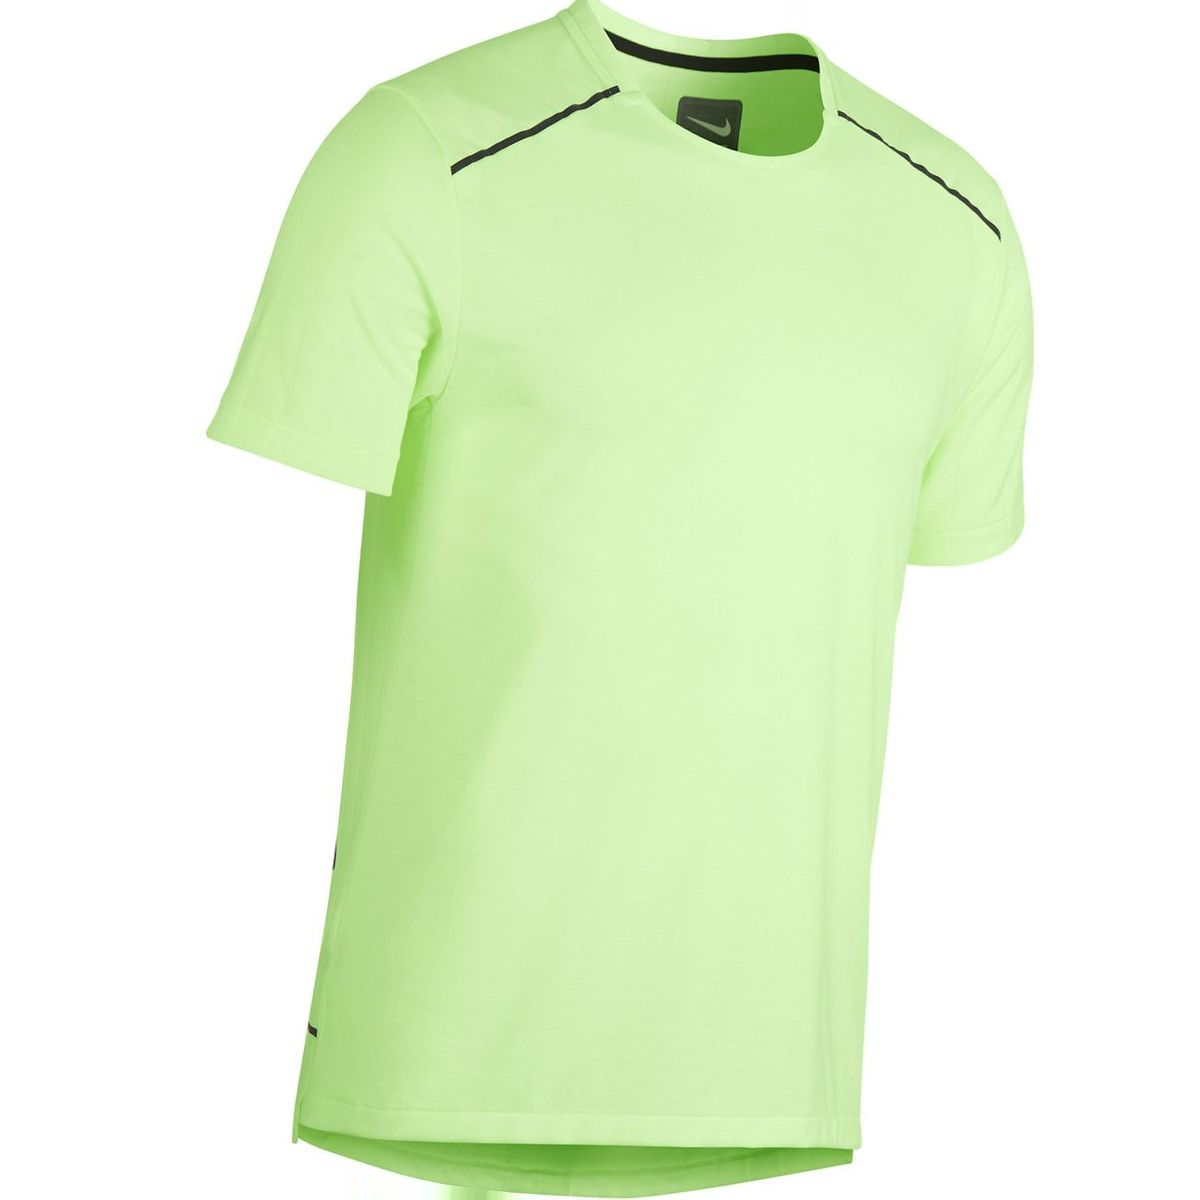 Nike Rise 365 Tech Pack Short-Sleeve Top - Men's